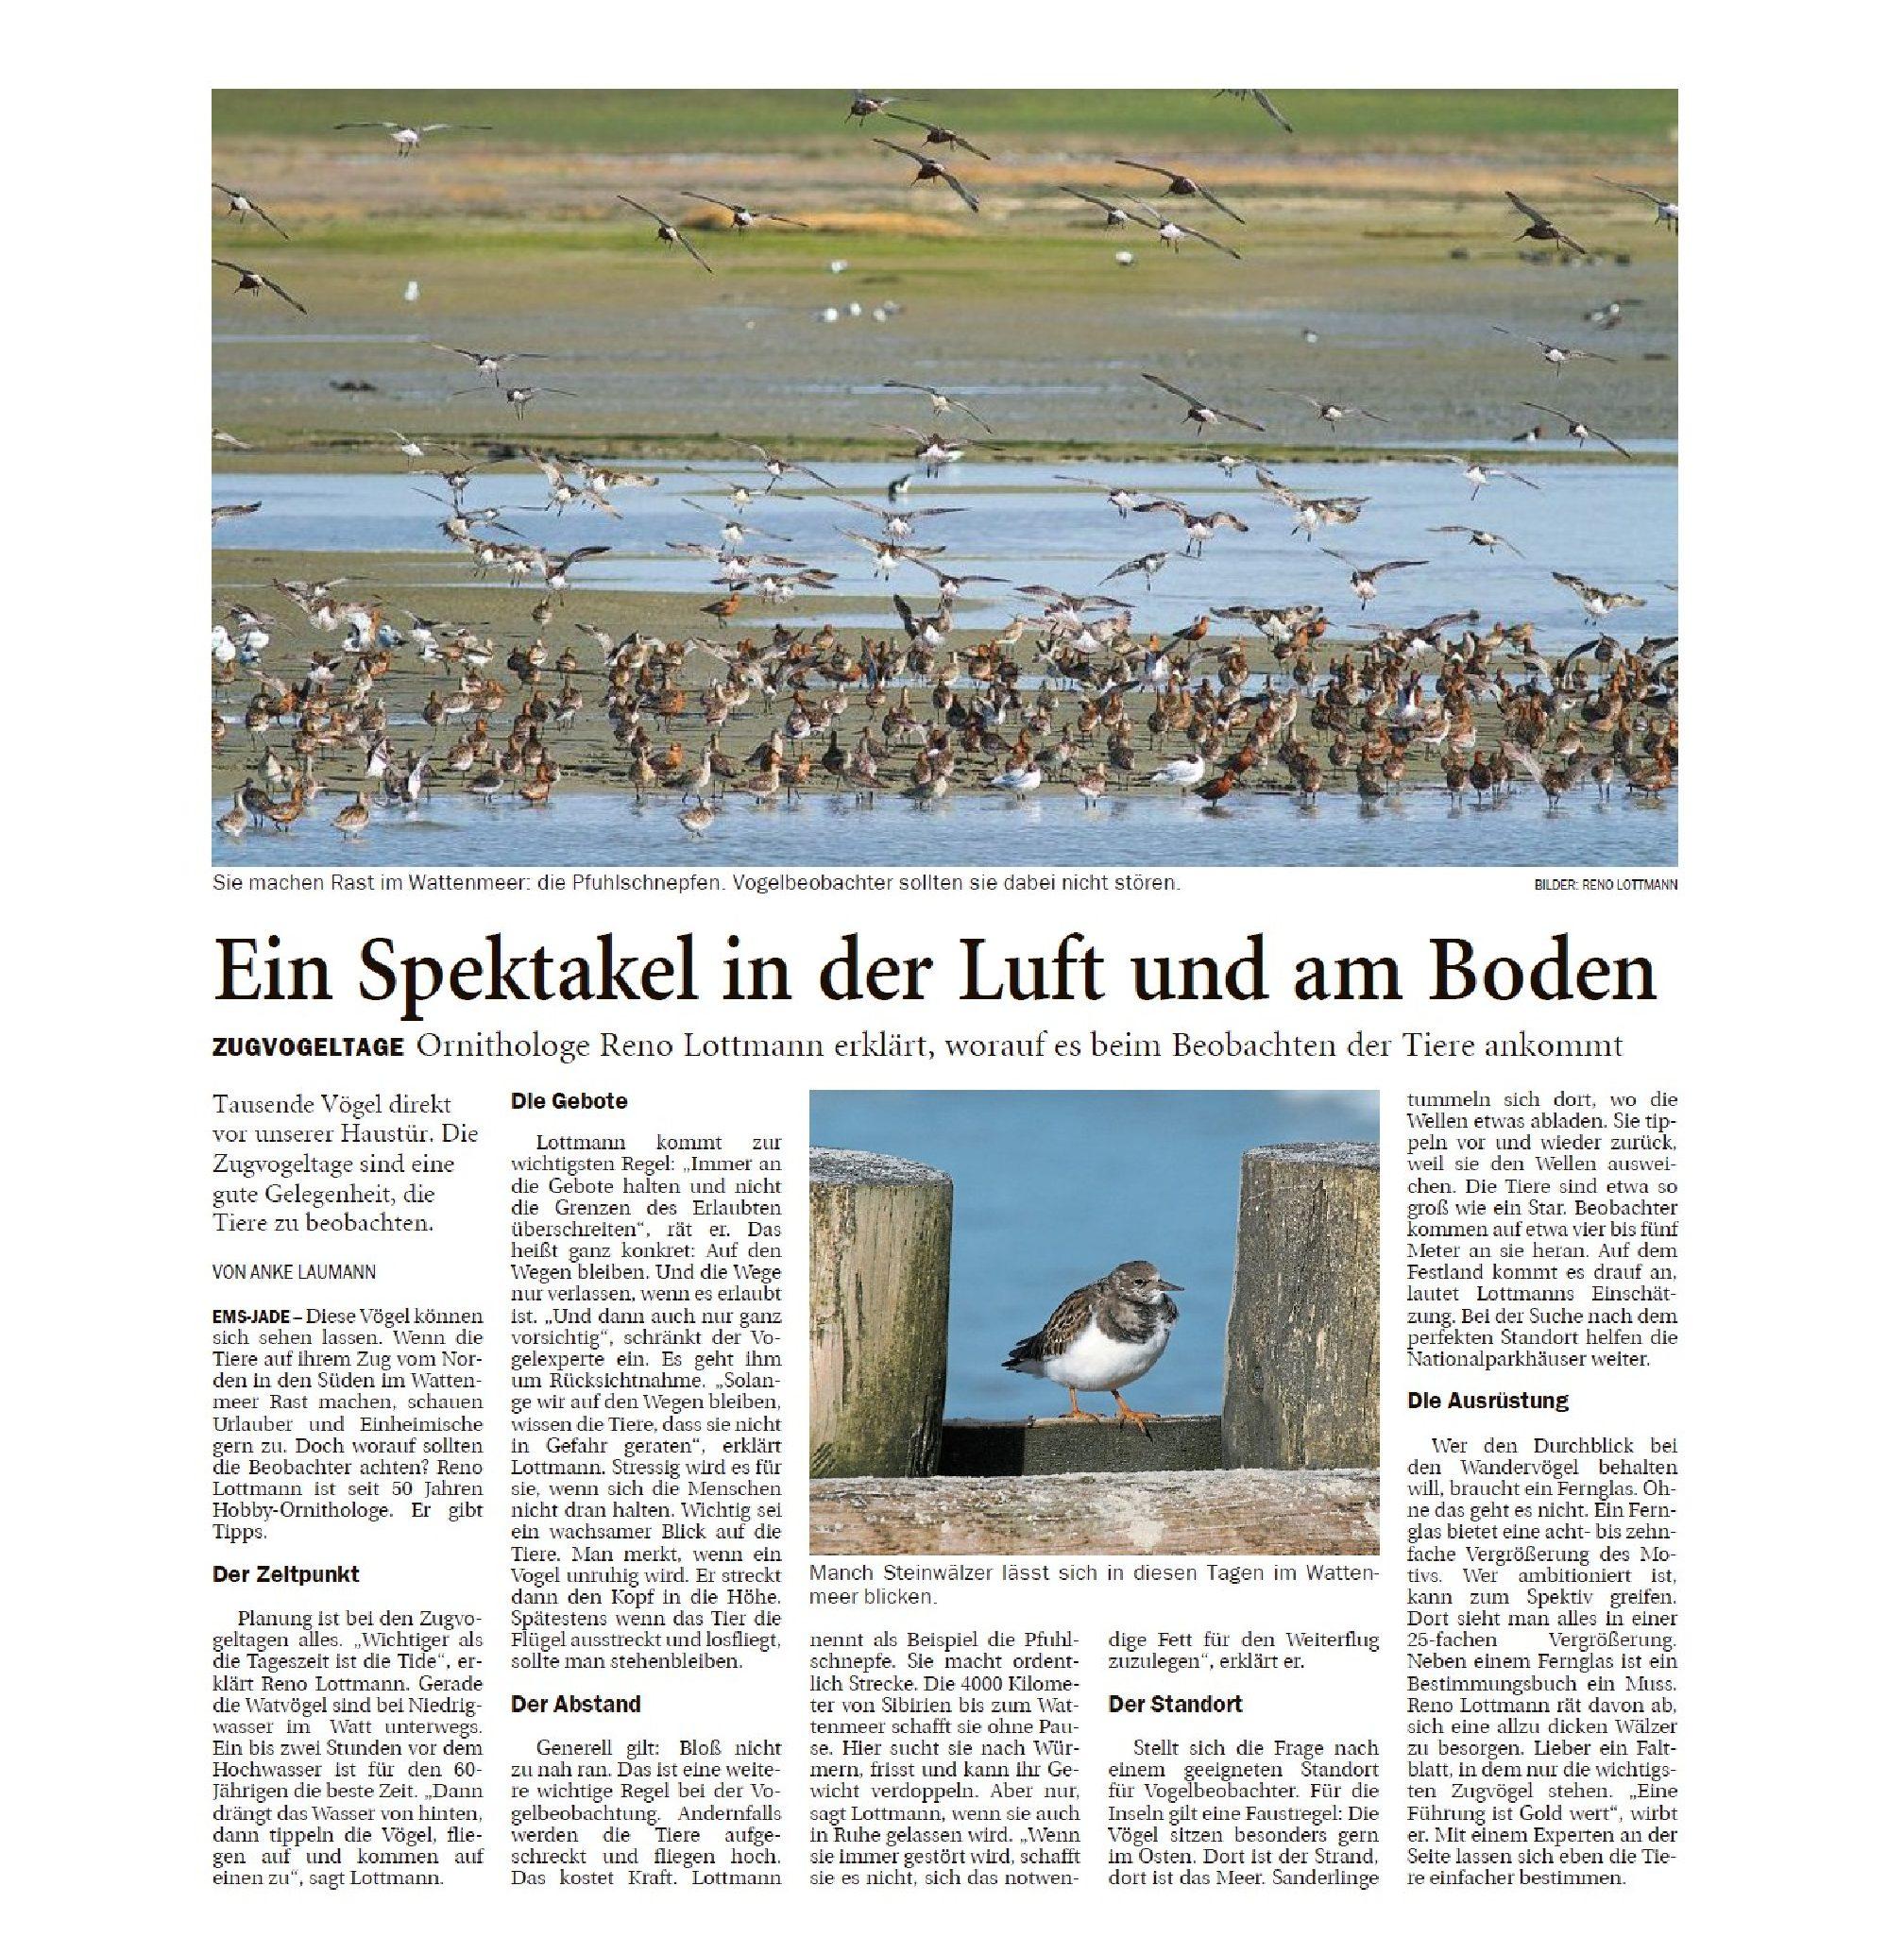 Jeversches Wochenblatt 16.10.2019 III